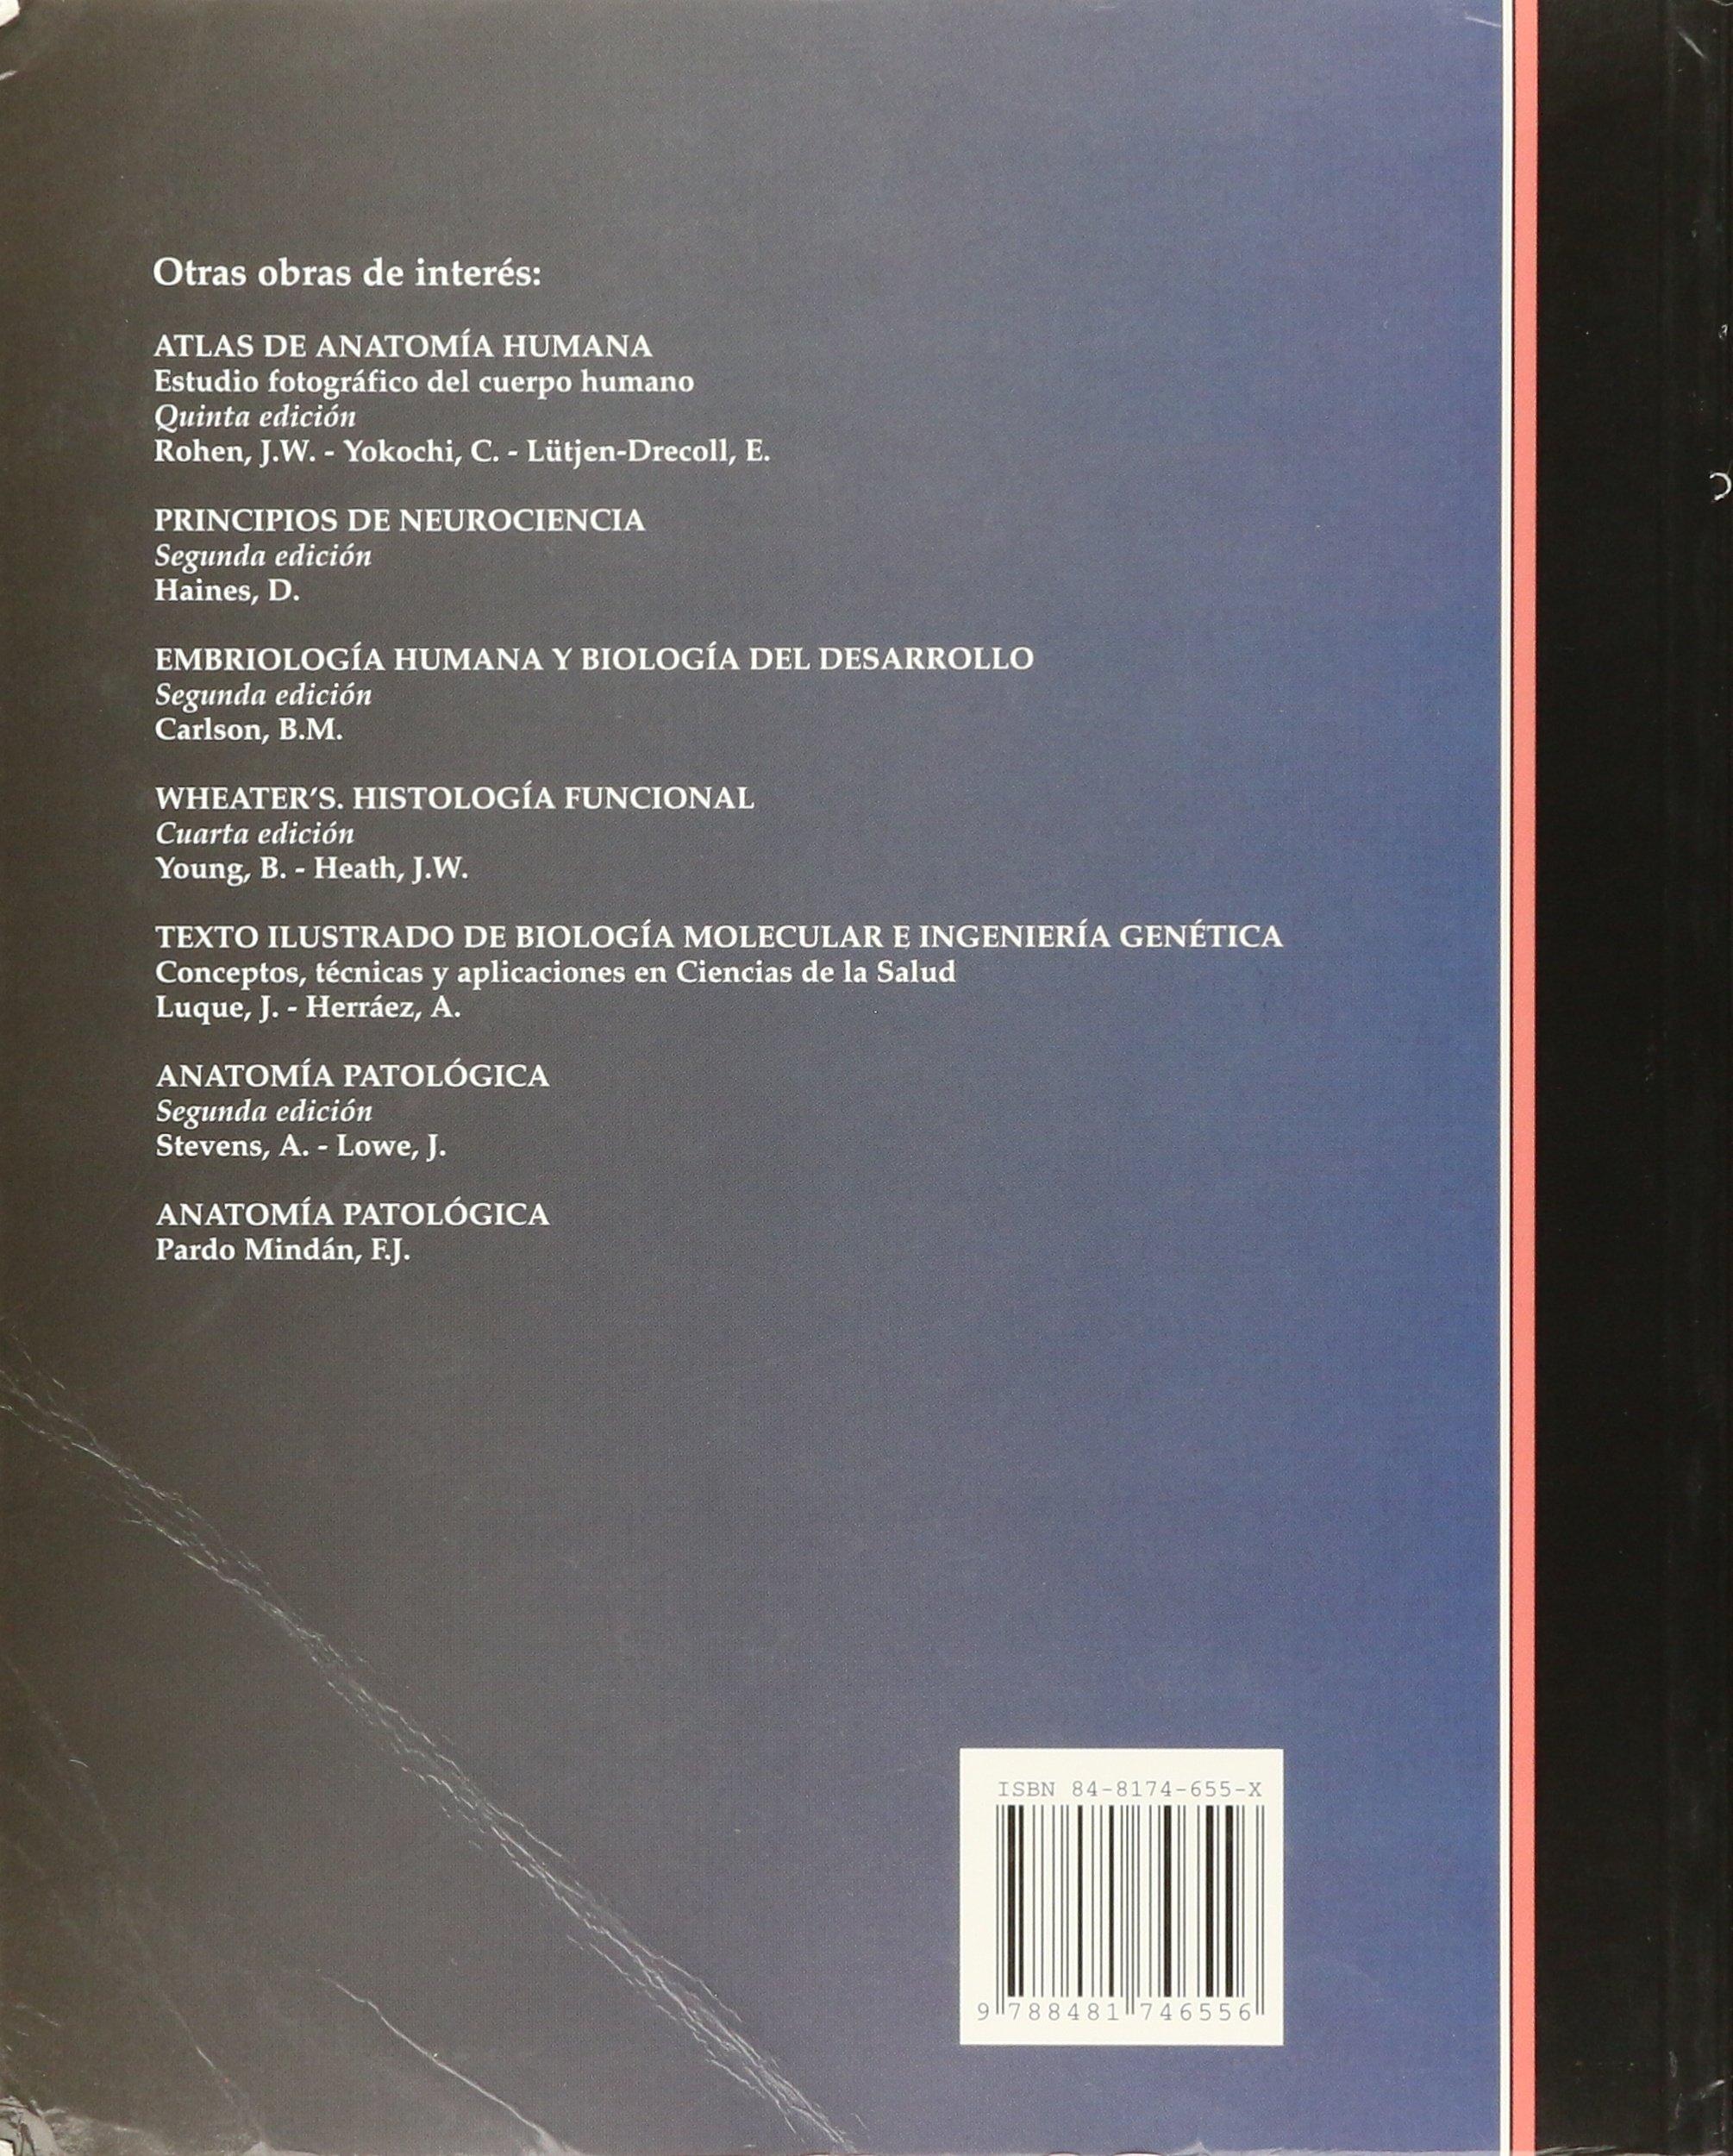 Embriologia Humana: William J. Larsen: Amazon.com.mx: Libros